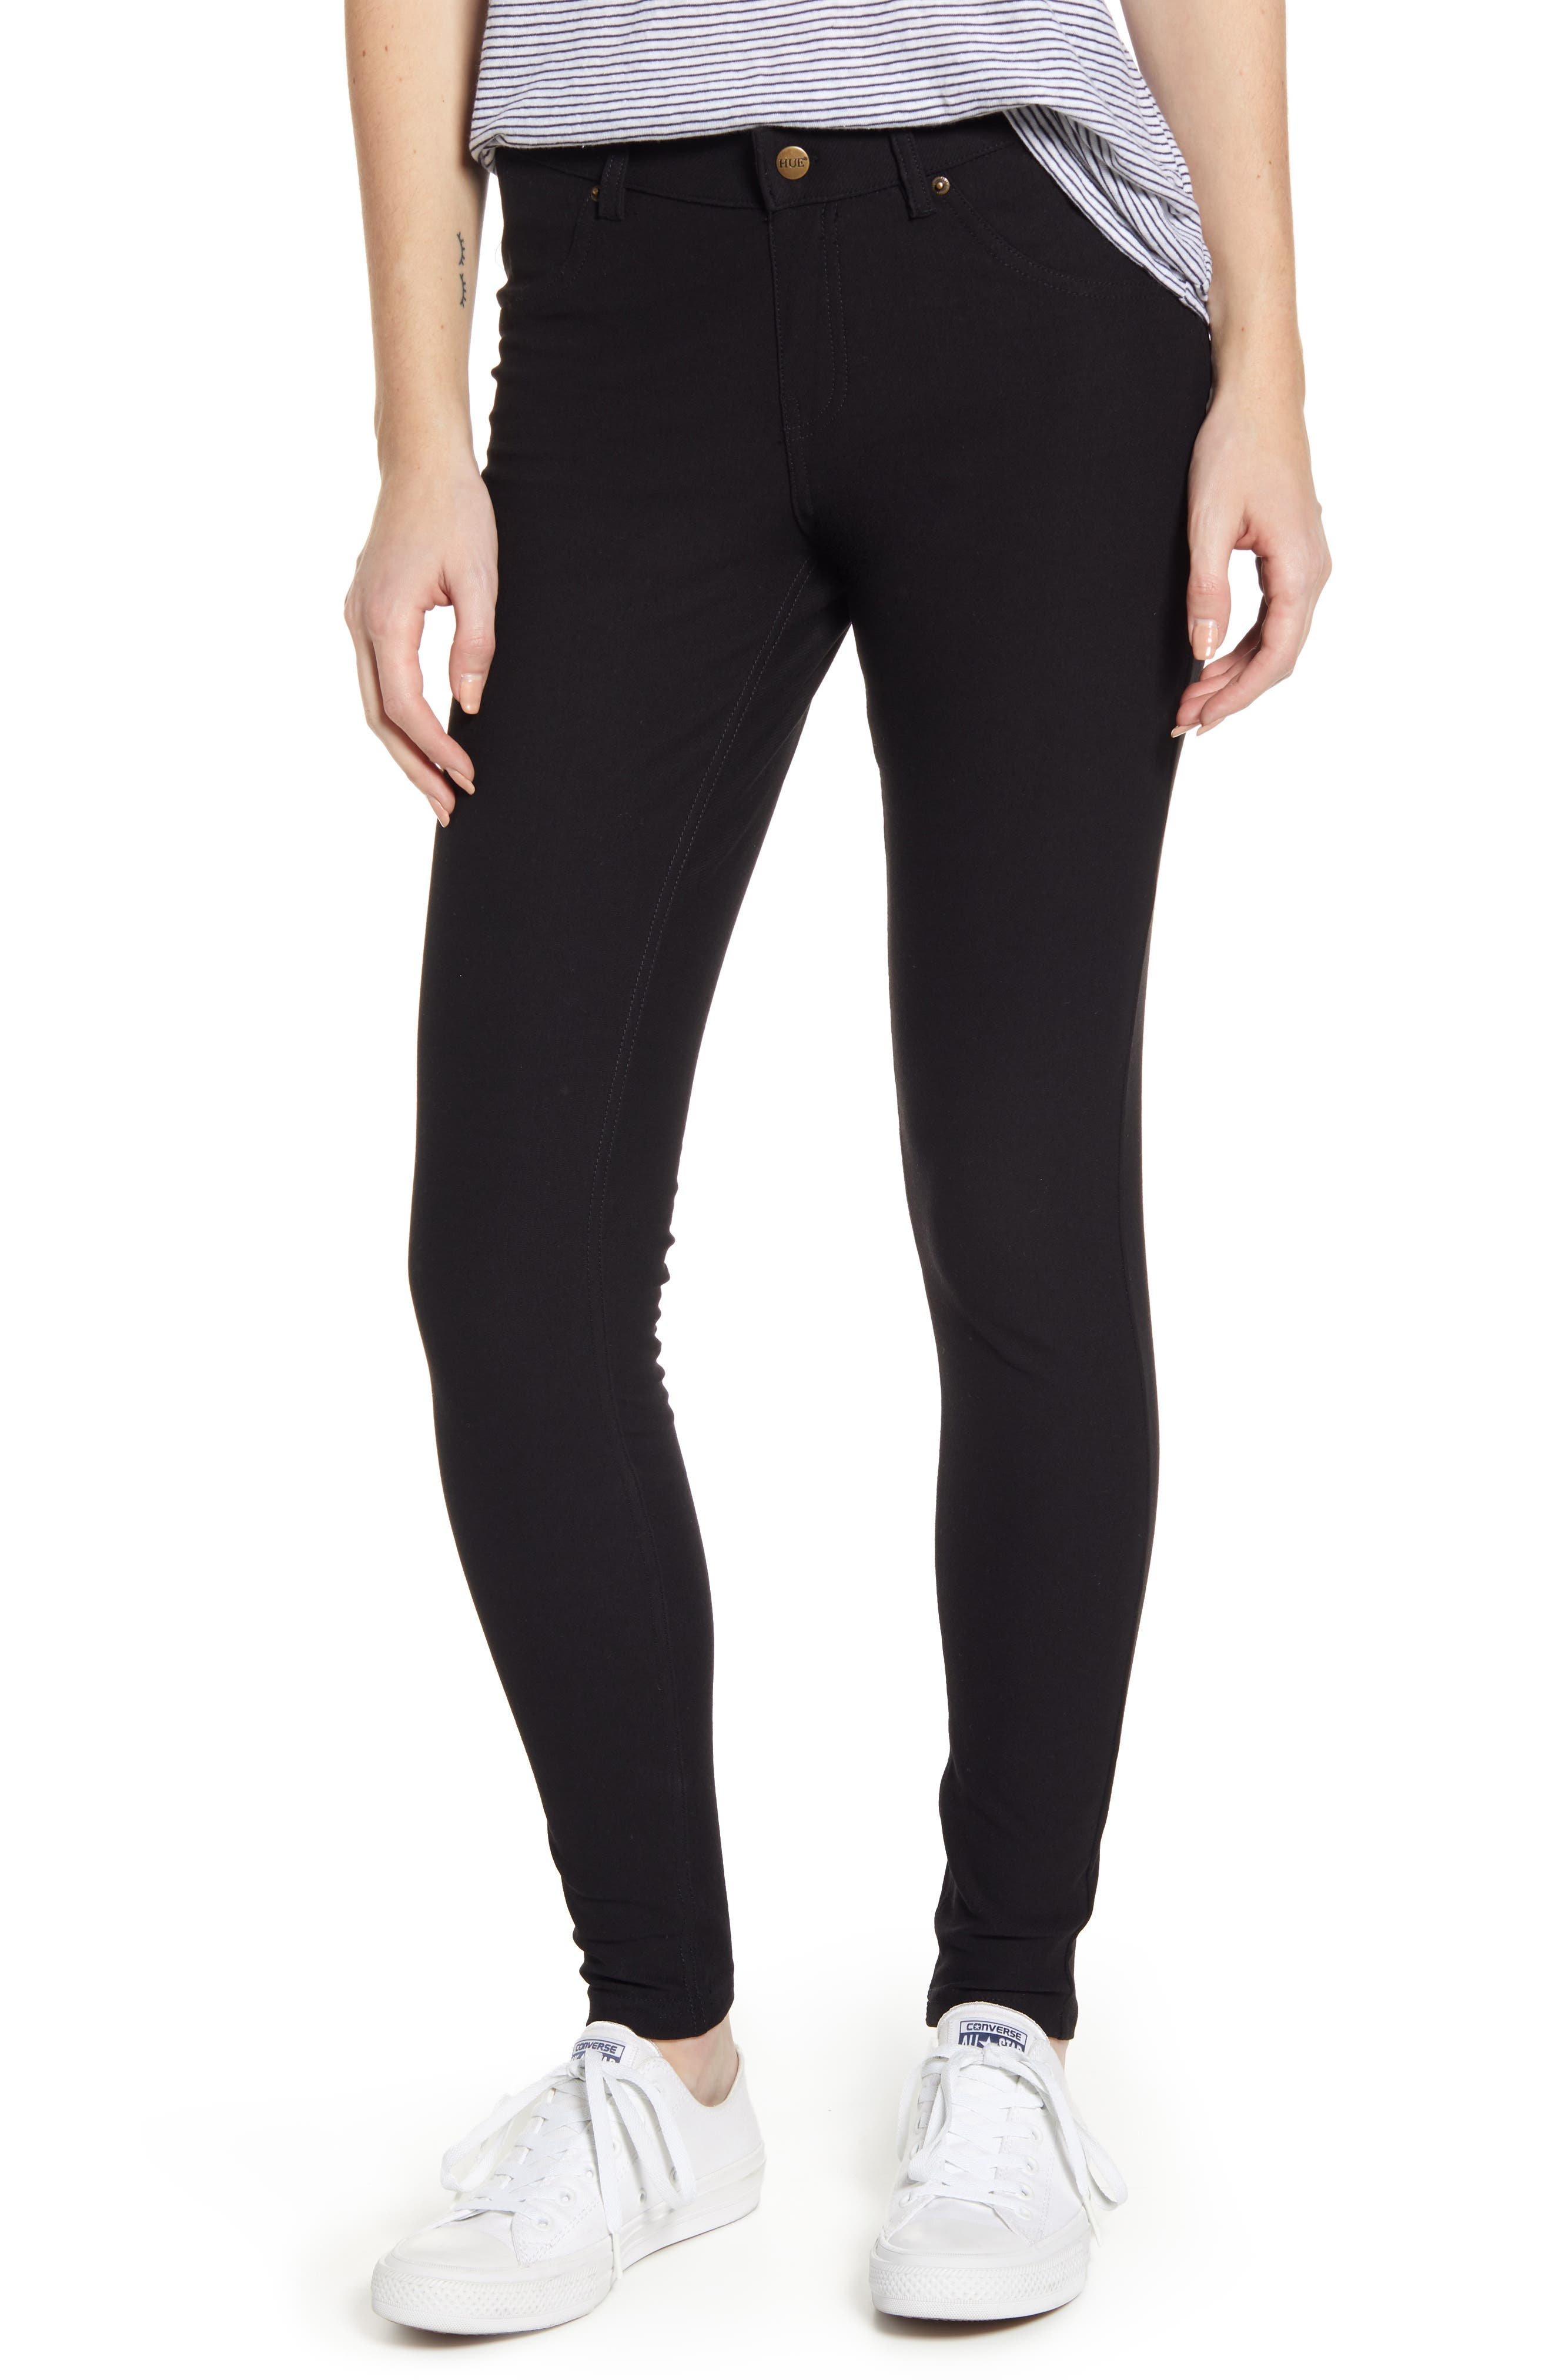 Hue Essential Denim Leggings, Black